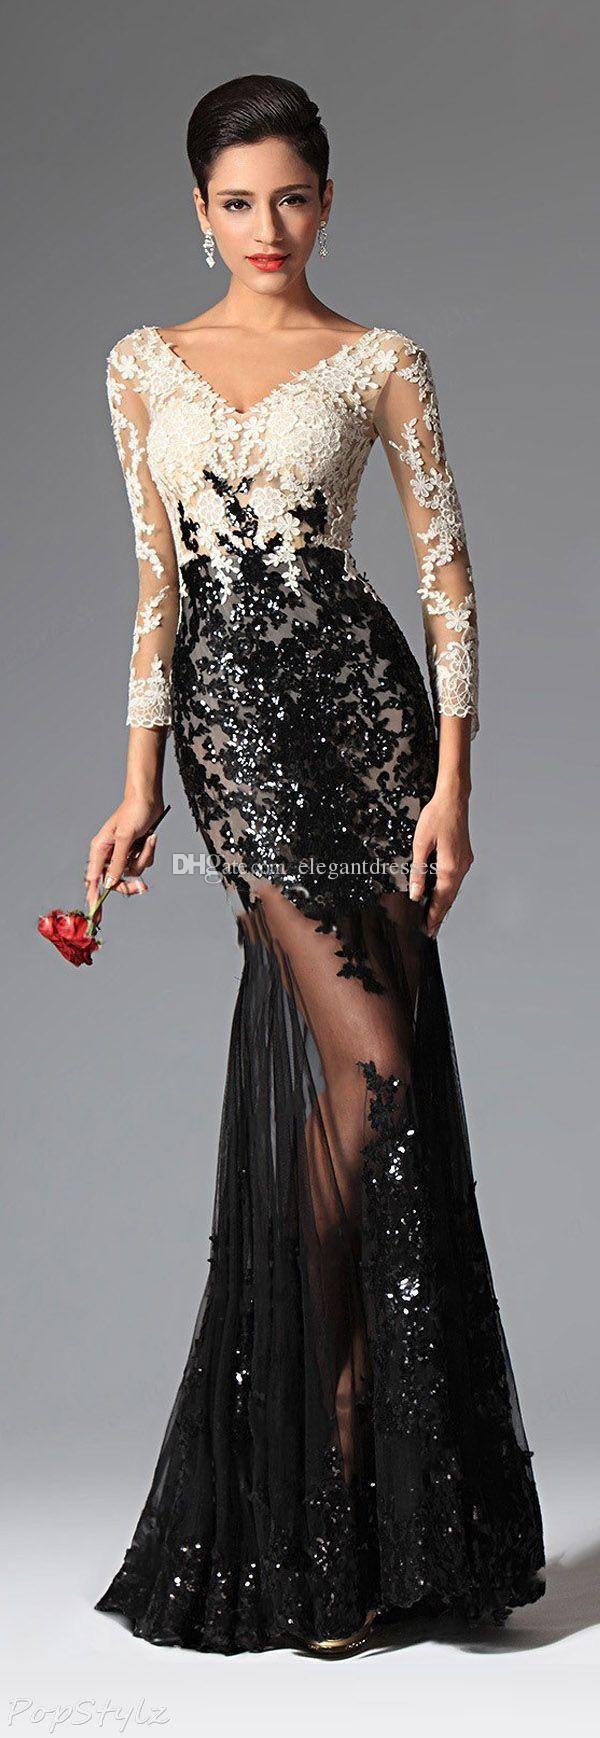 Custom made lace sequined evening dresses vneck sheer long